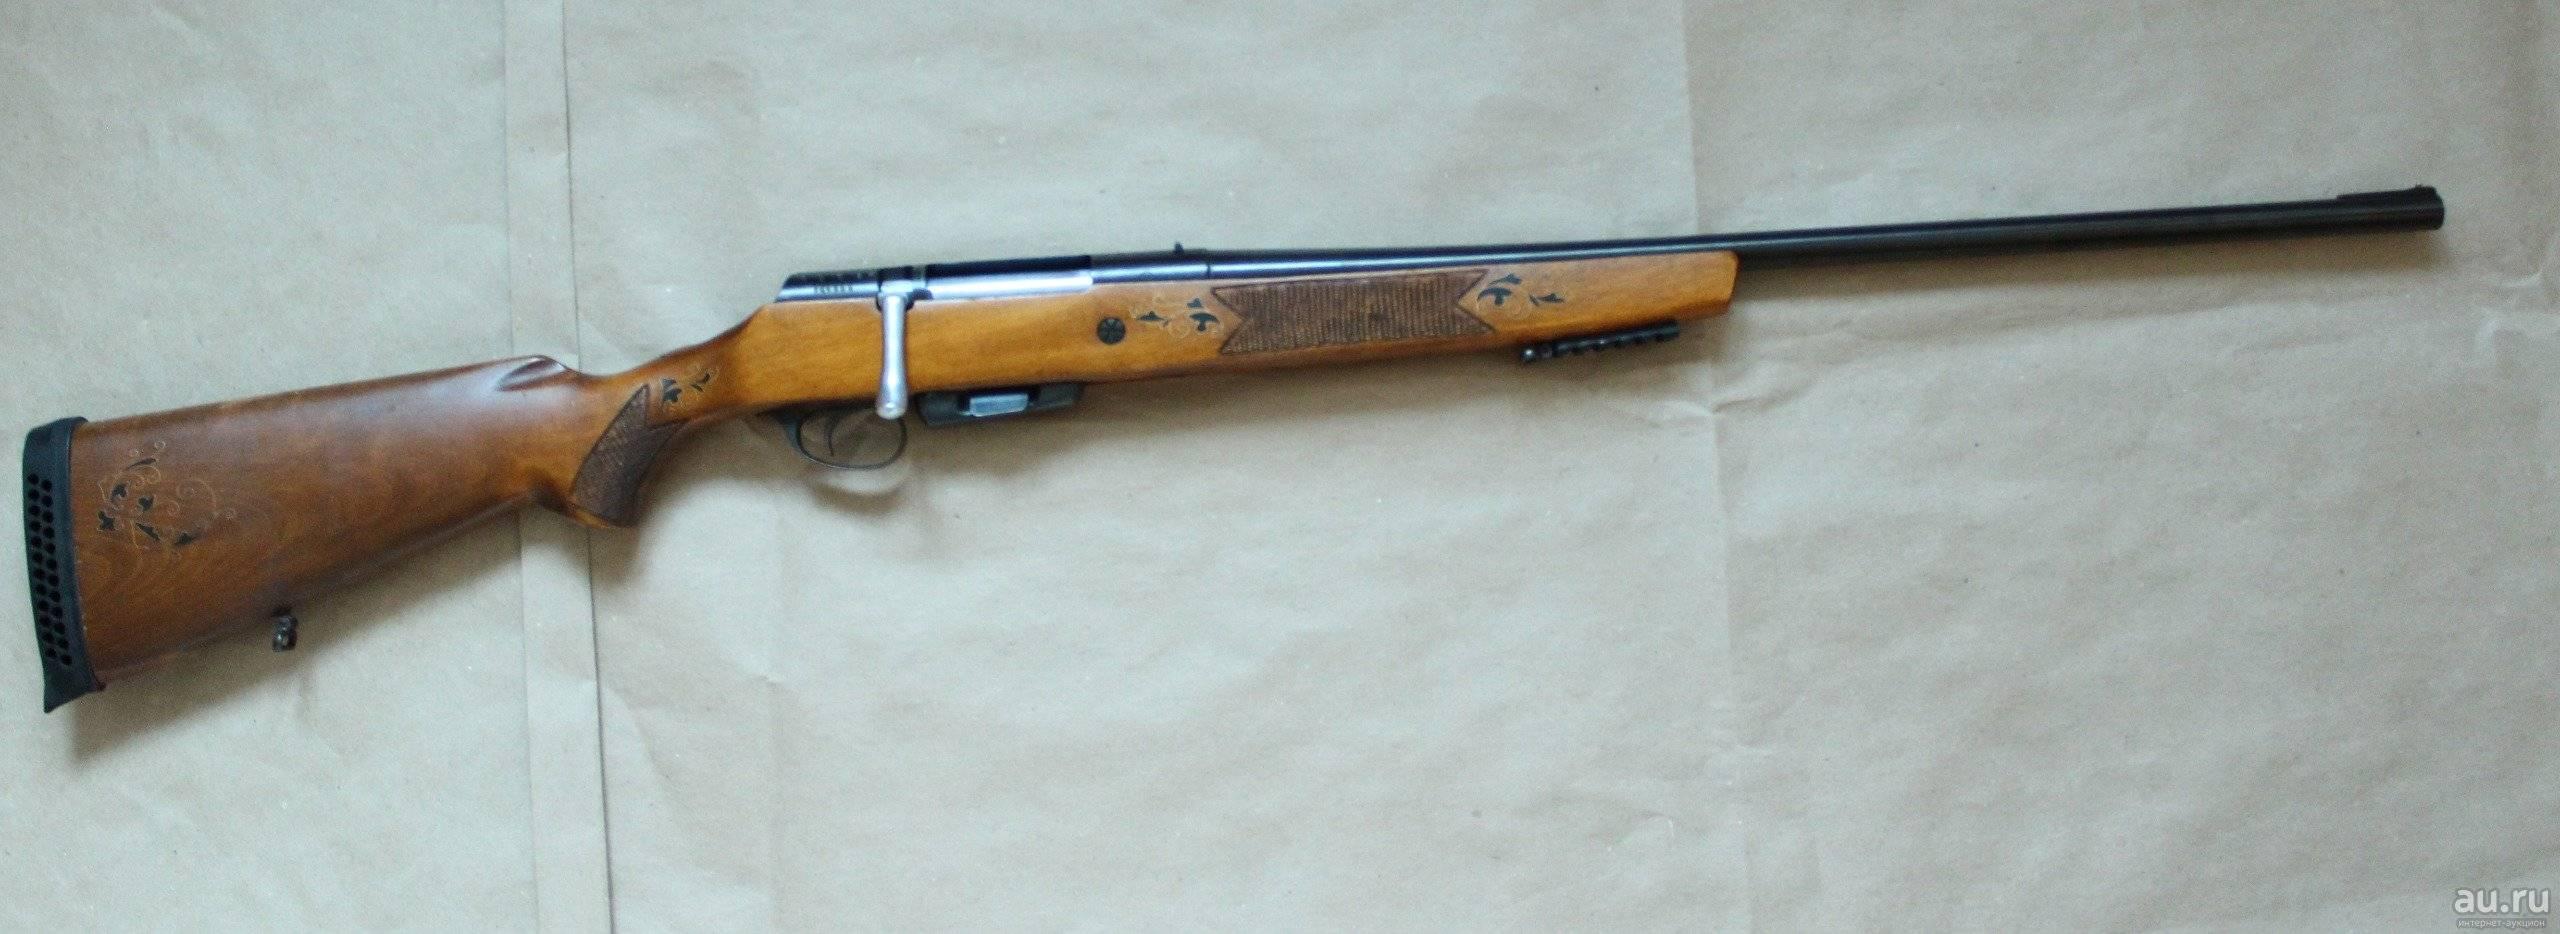 Мц 20-01. охотничье ружье мц 20-01. характеристики, фото